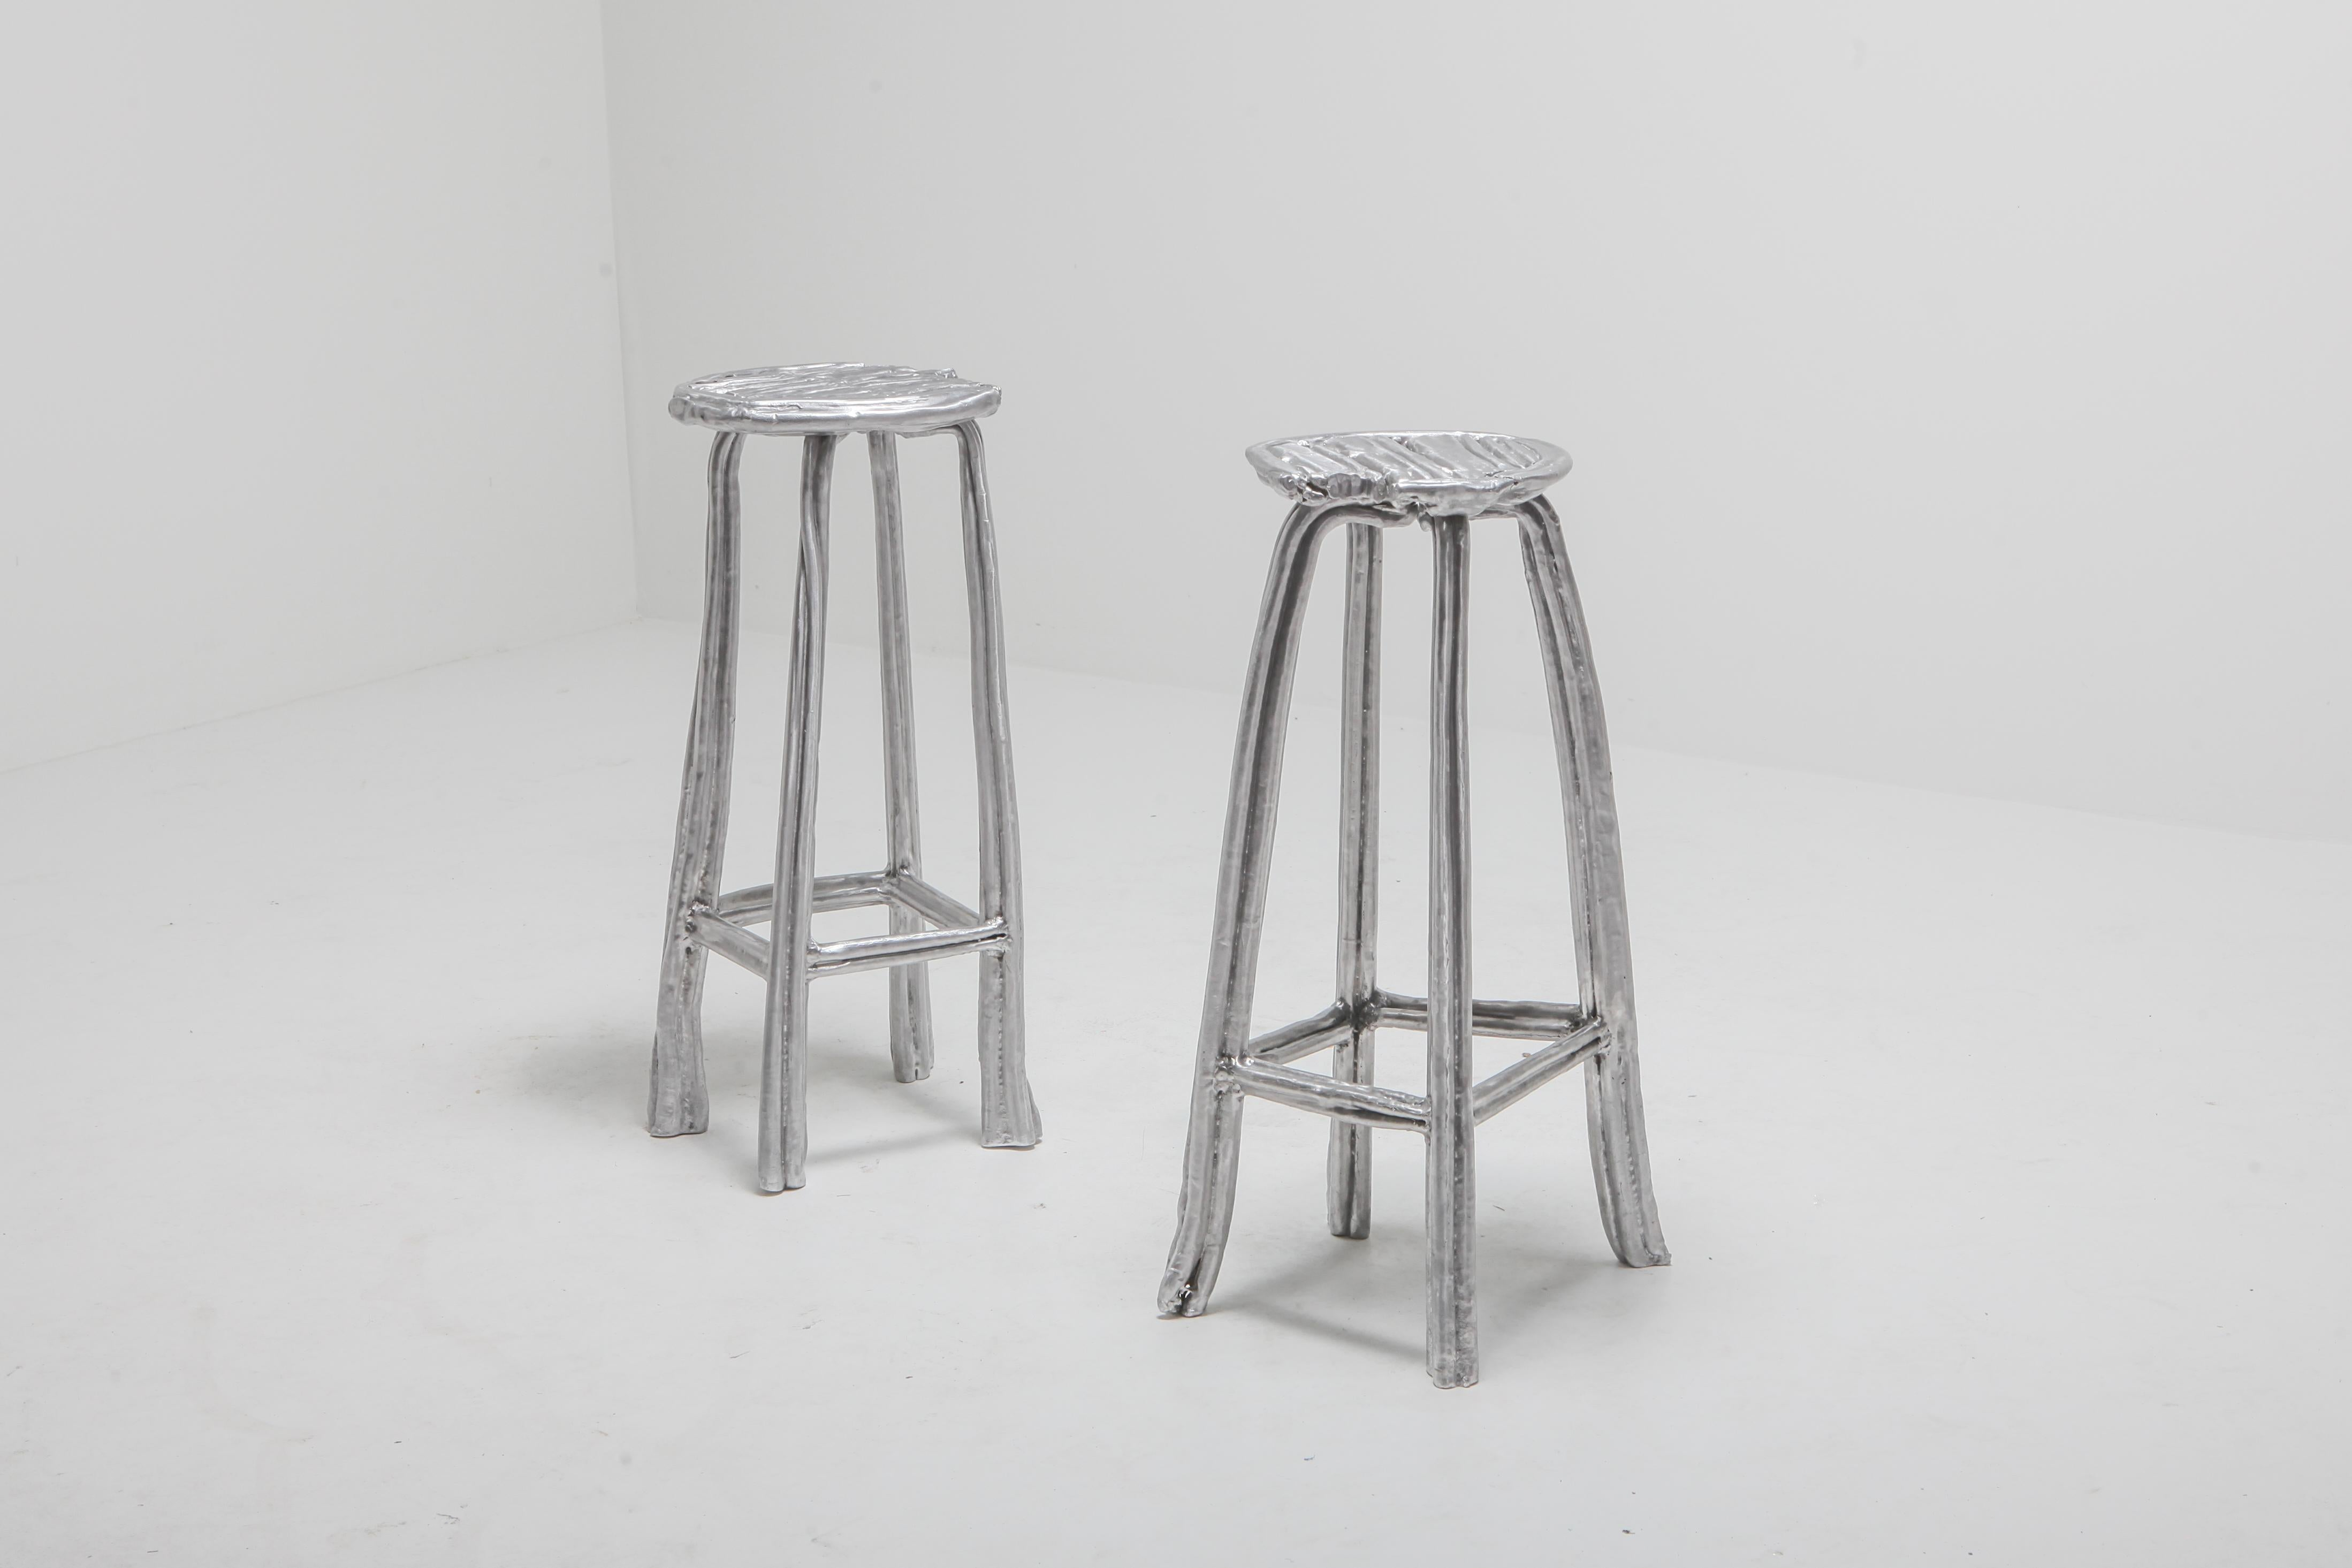 Functional Art Or Collectible Design Piece Cast Aluminum Bar Stool T 009 By  Nicolas Erauw